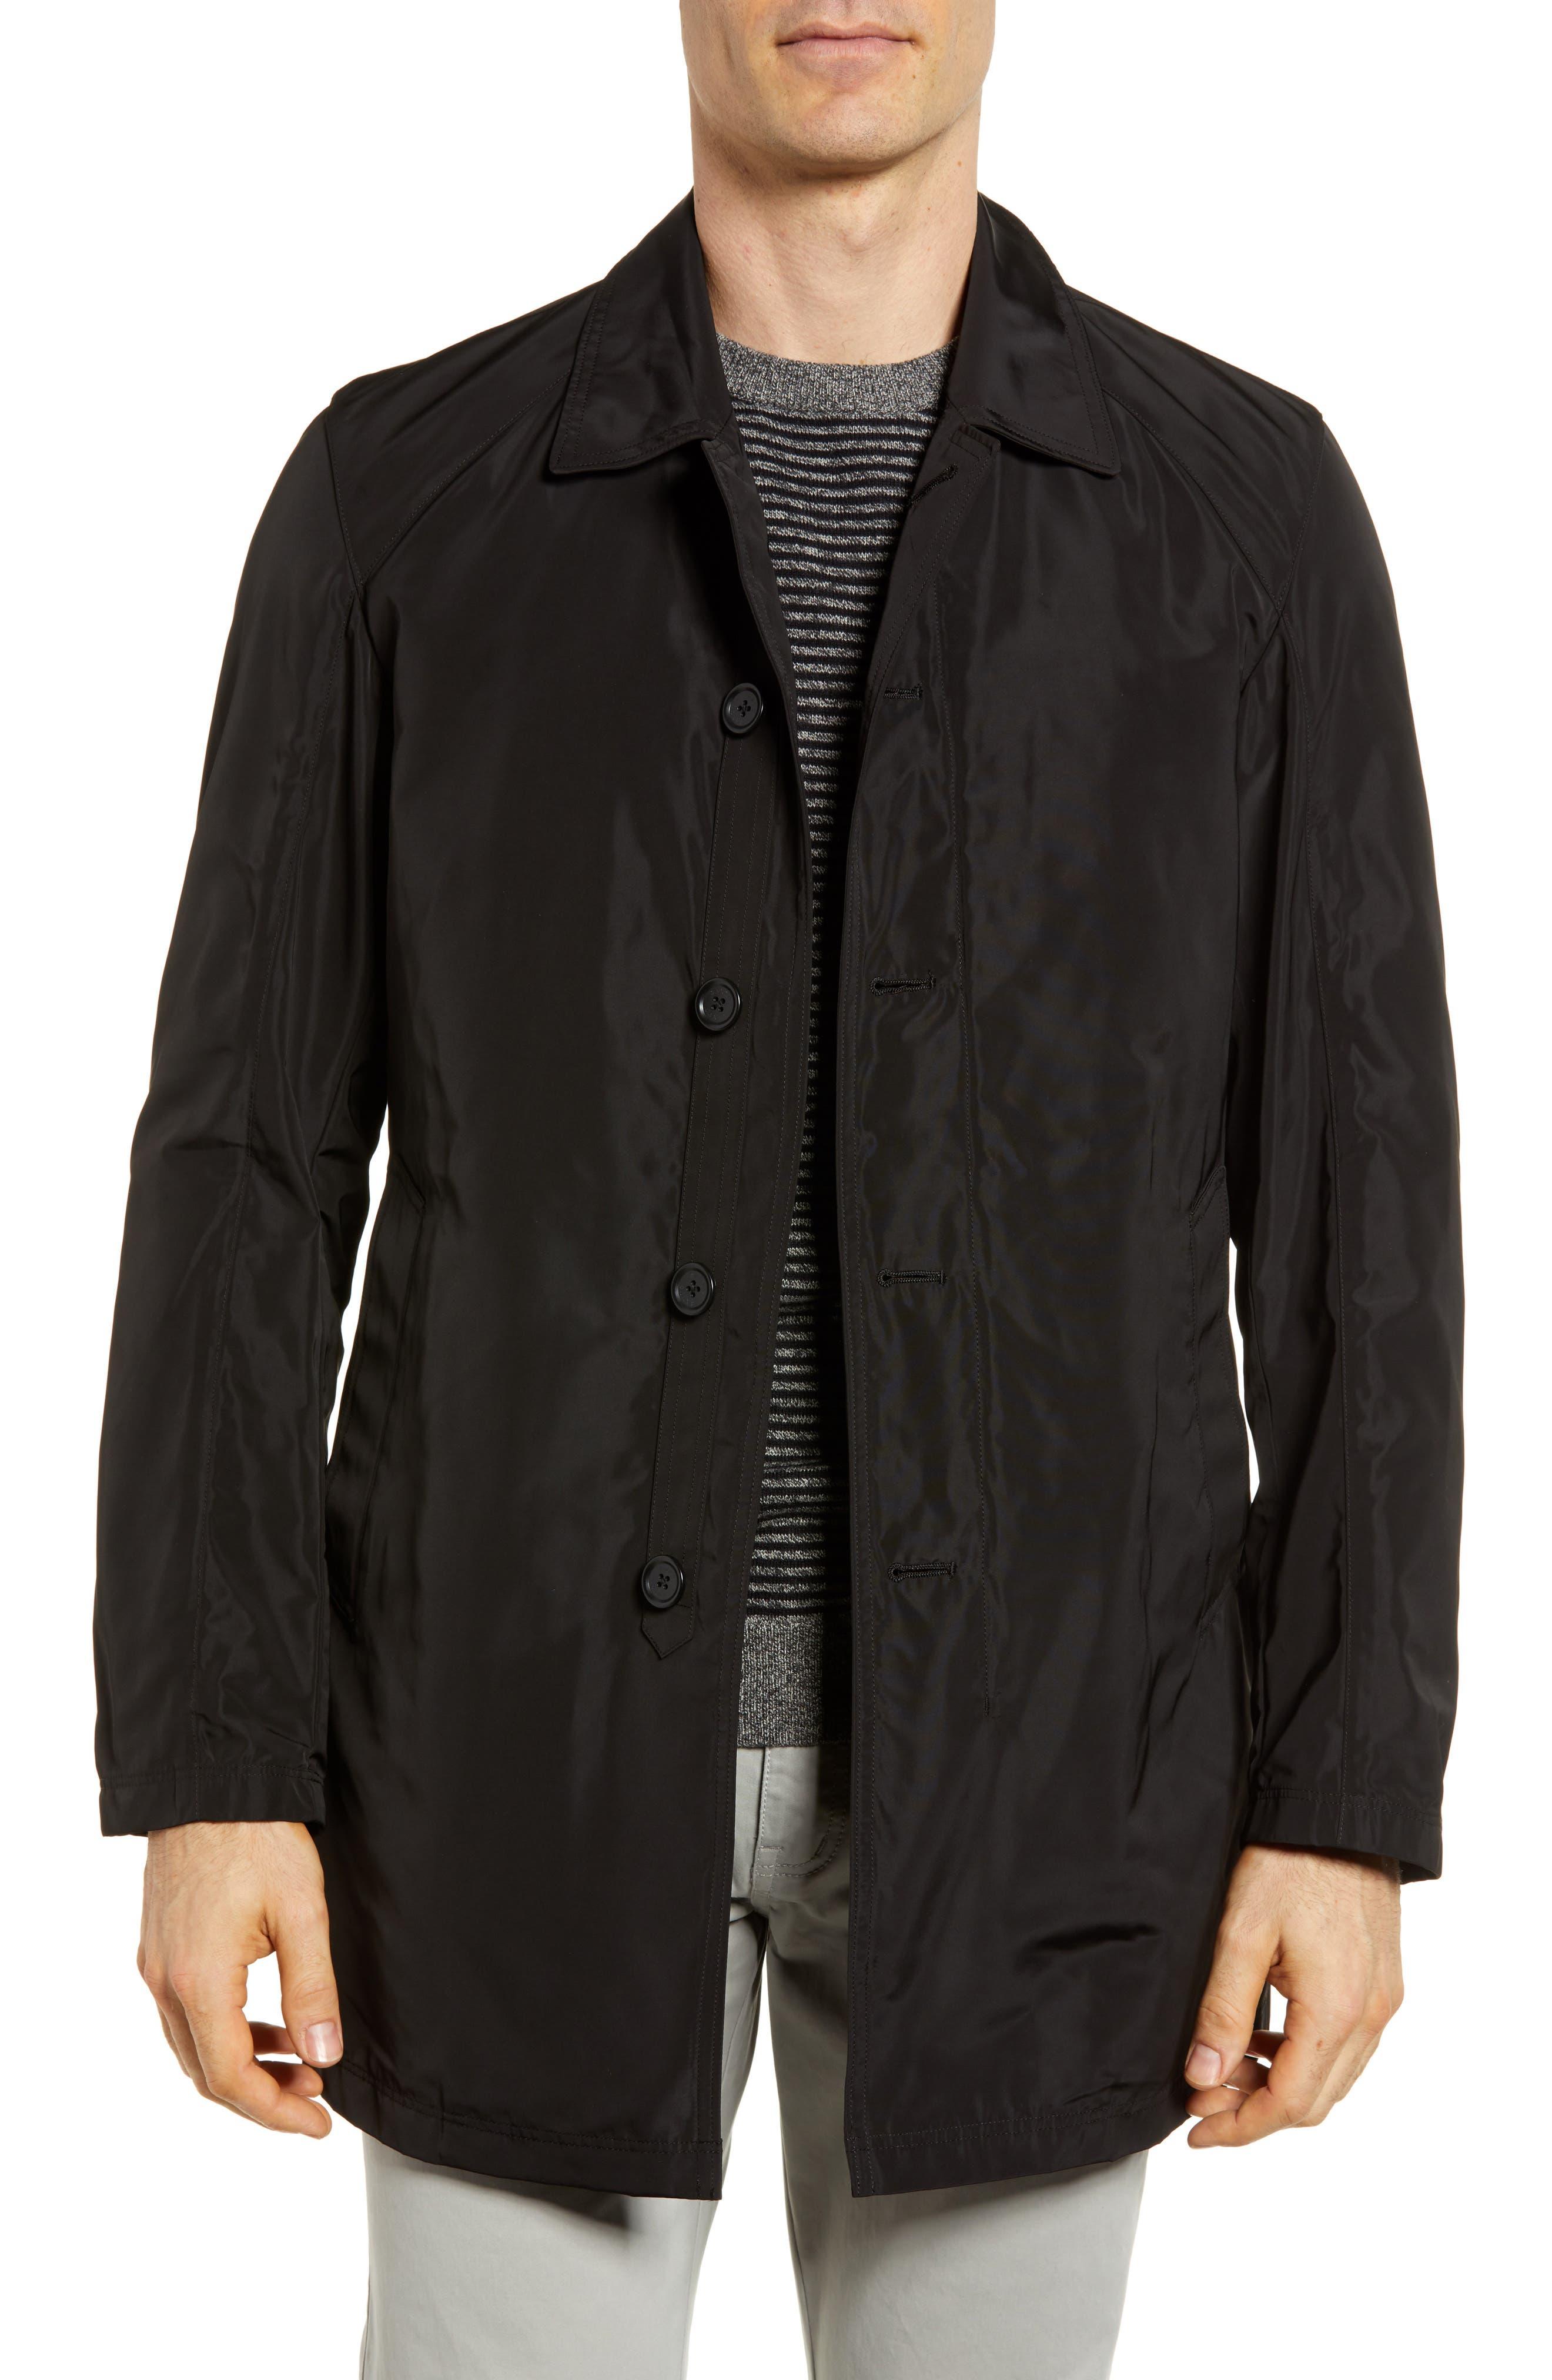 S/B Raincoat,                             Main thumbnail 1, color,                             Black